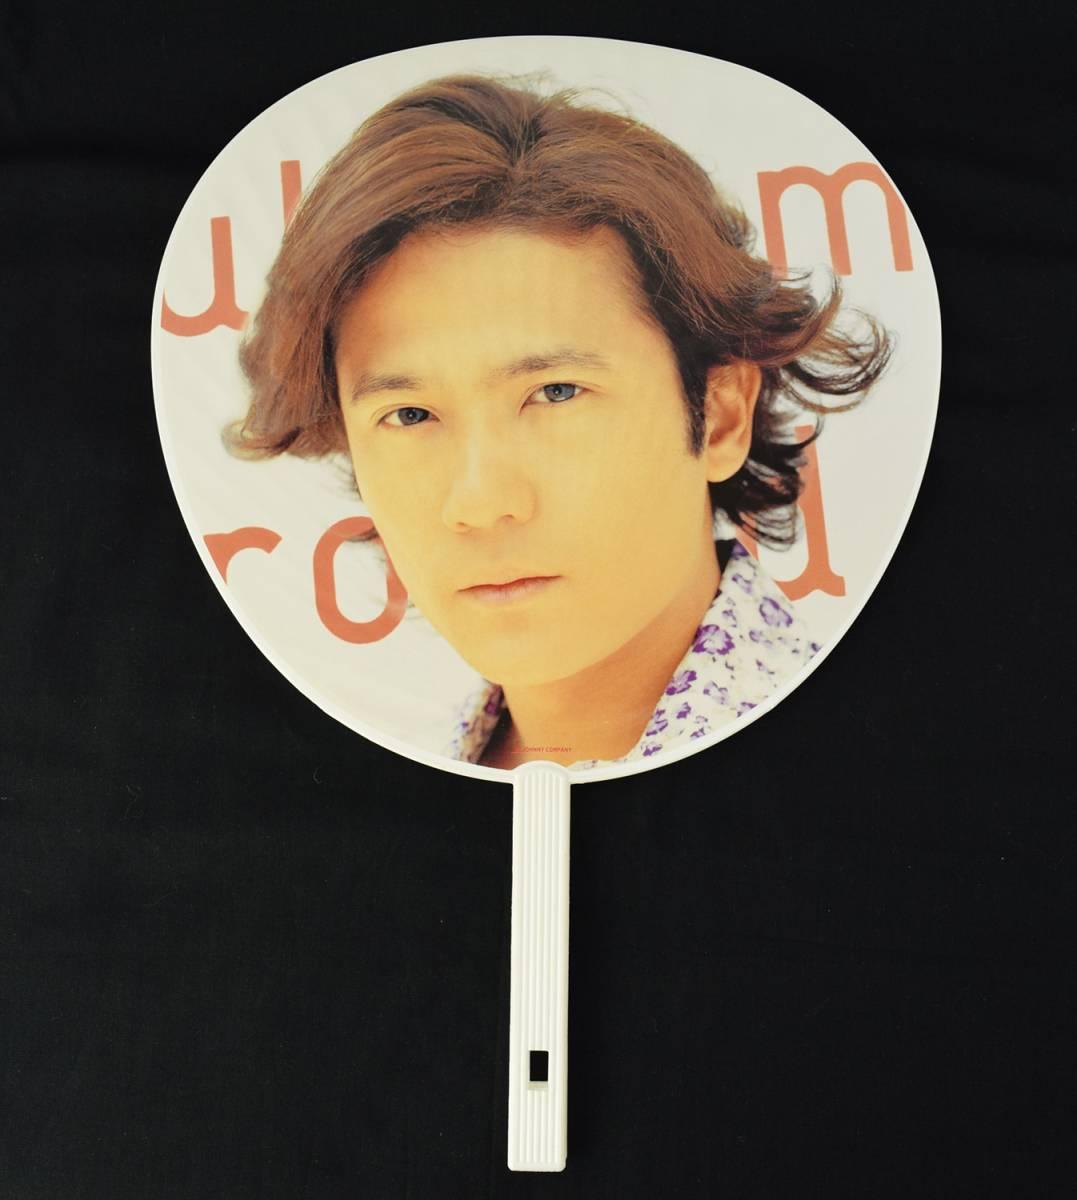 △335O/稲垣吾郎 ジャンボうちわ(2枚接着) SMAP